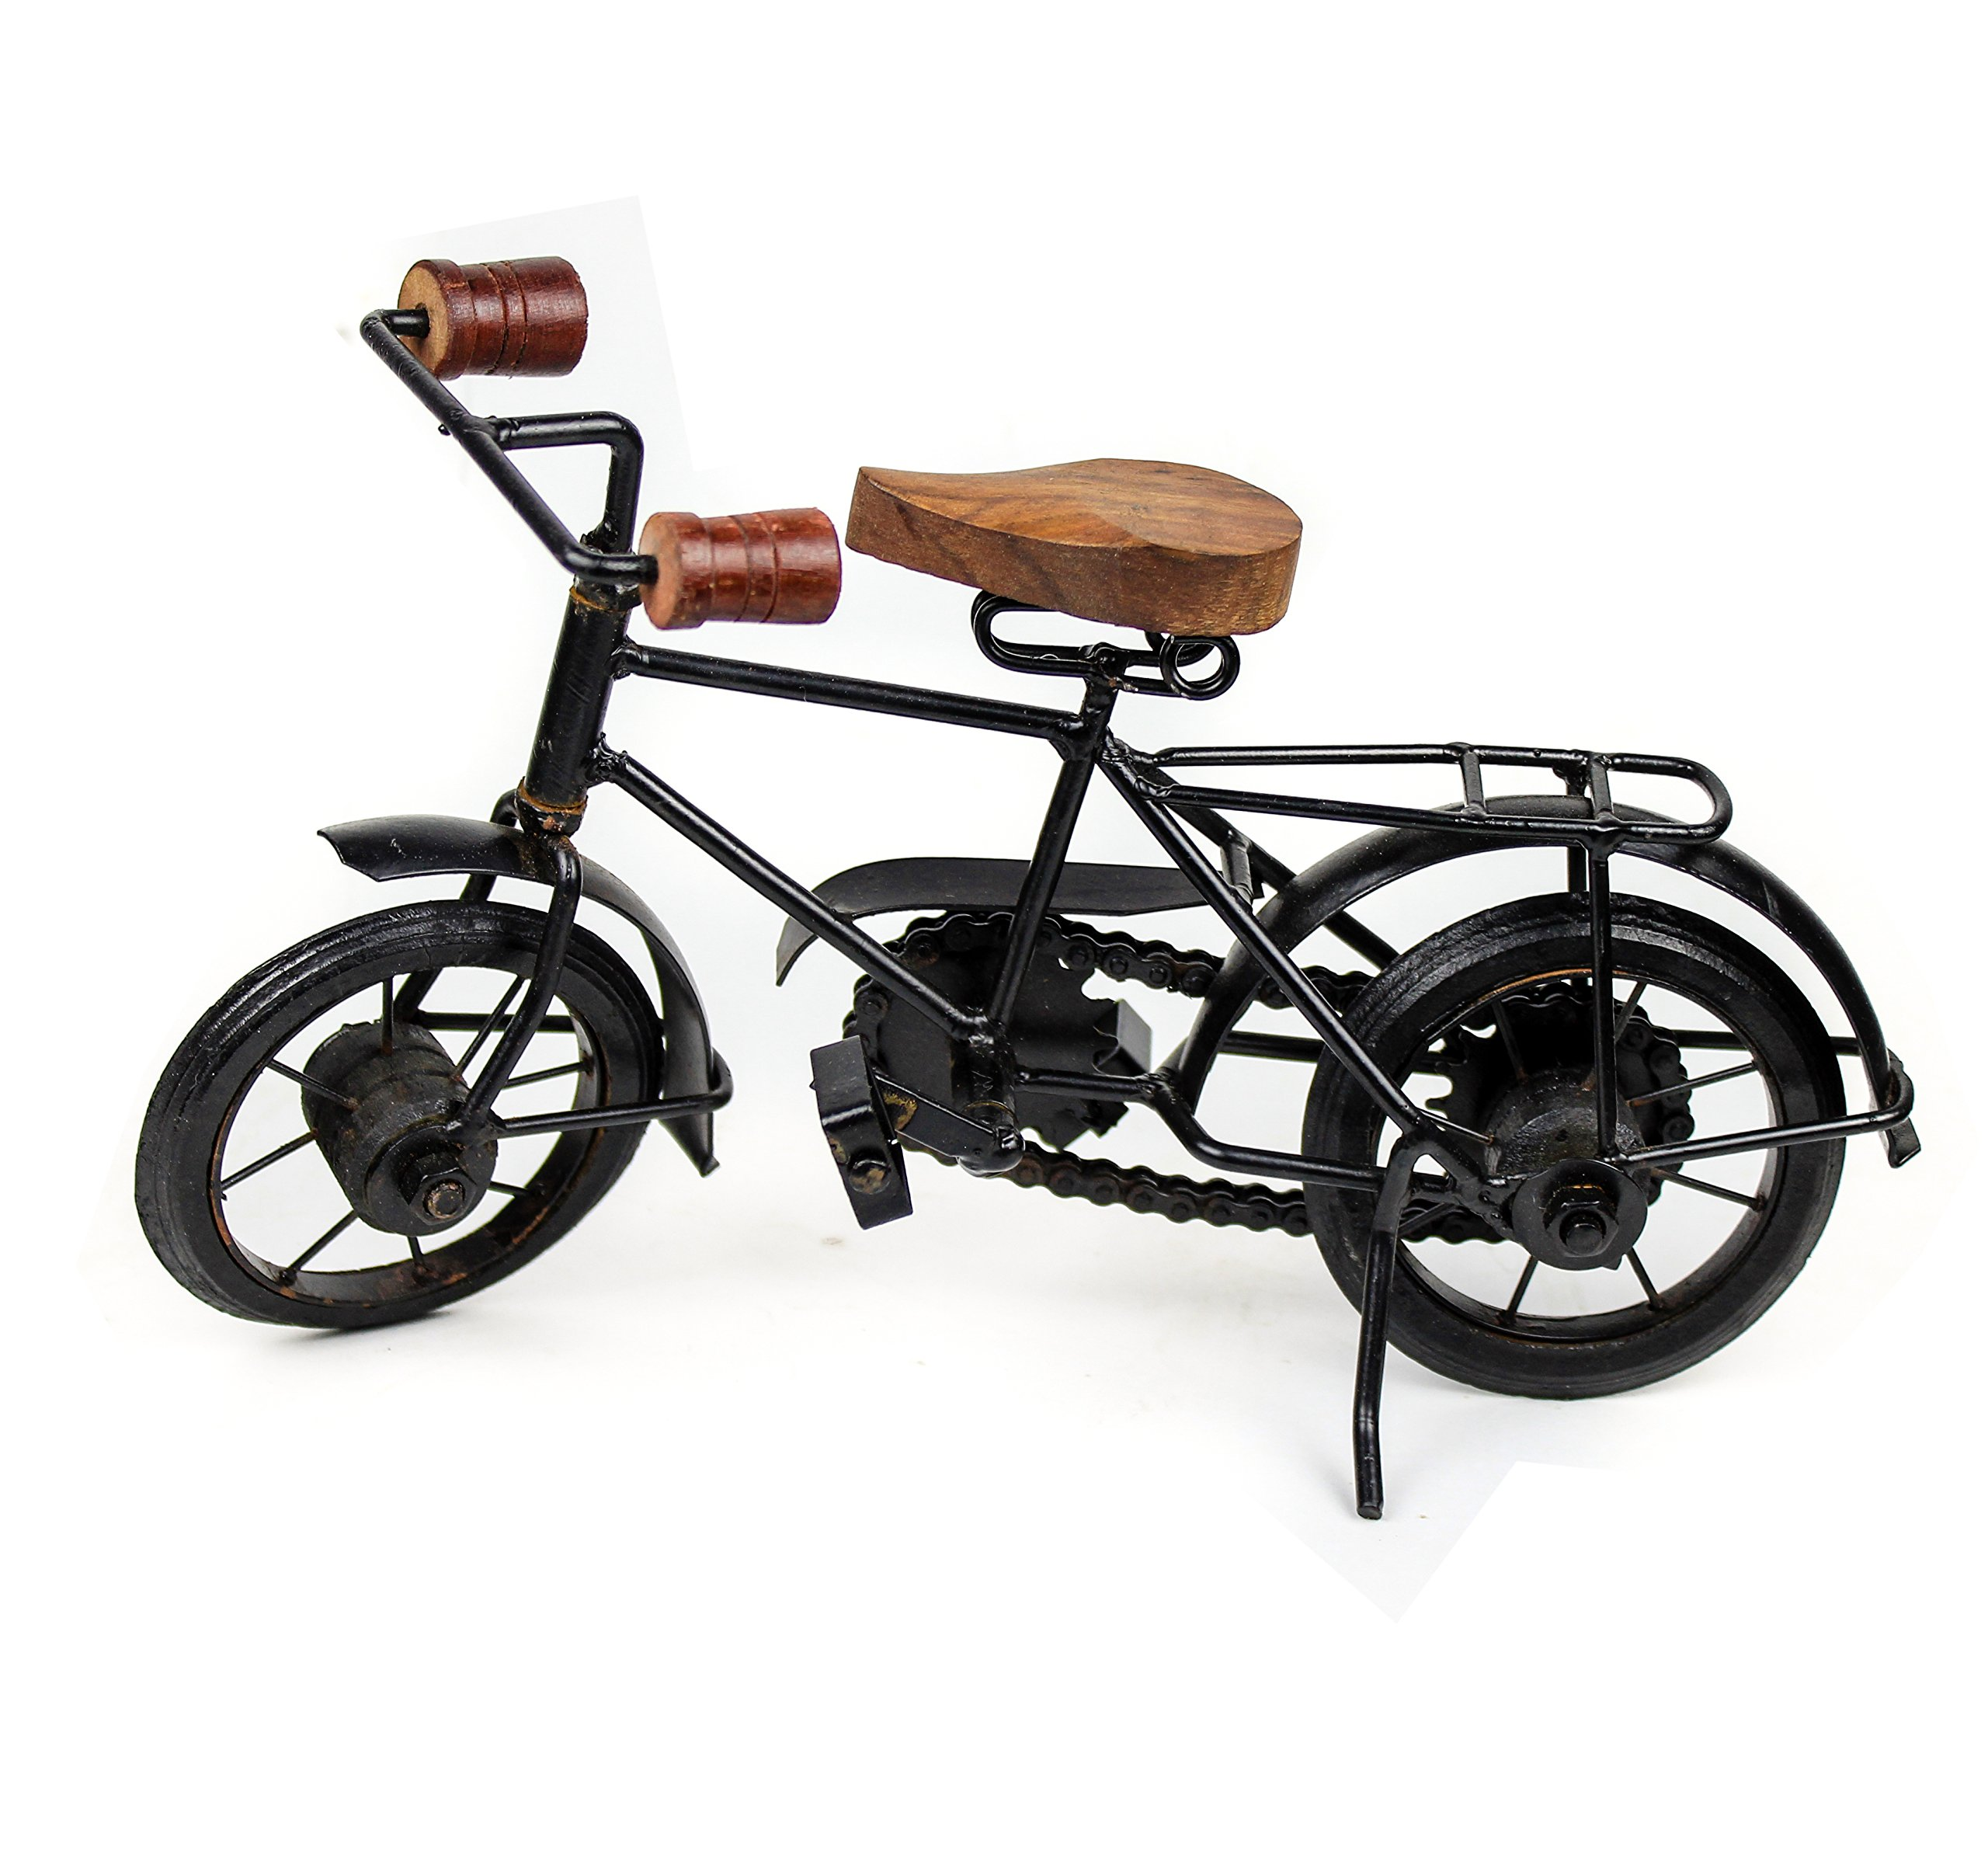 Nagina International Home Decor Iron Metal Crafted Beautiful Finger Bike | Table Decor Gifts Vehicle | Games Toy Cycle (Postman) by Nagina International